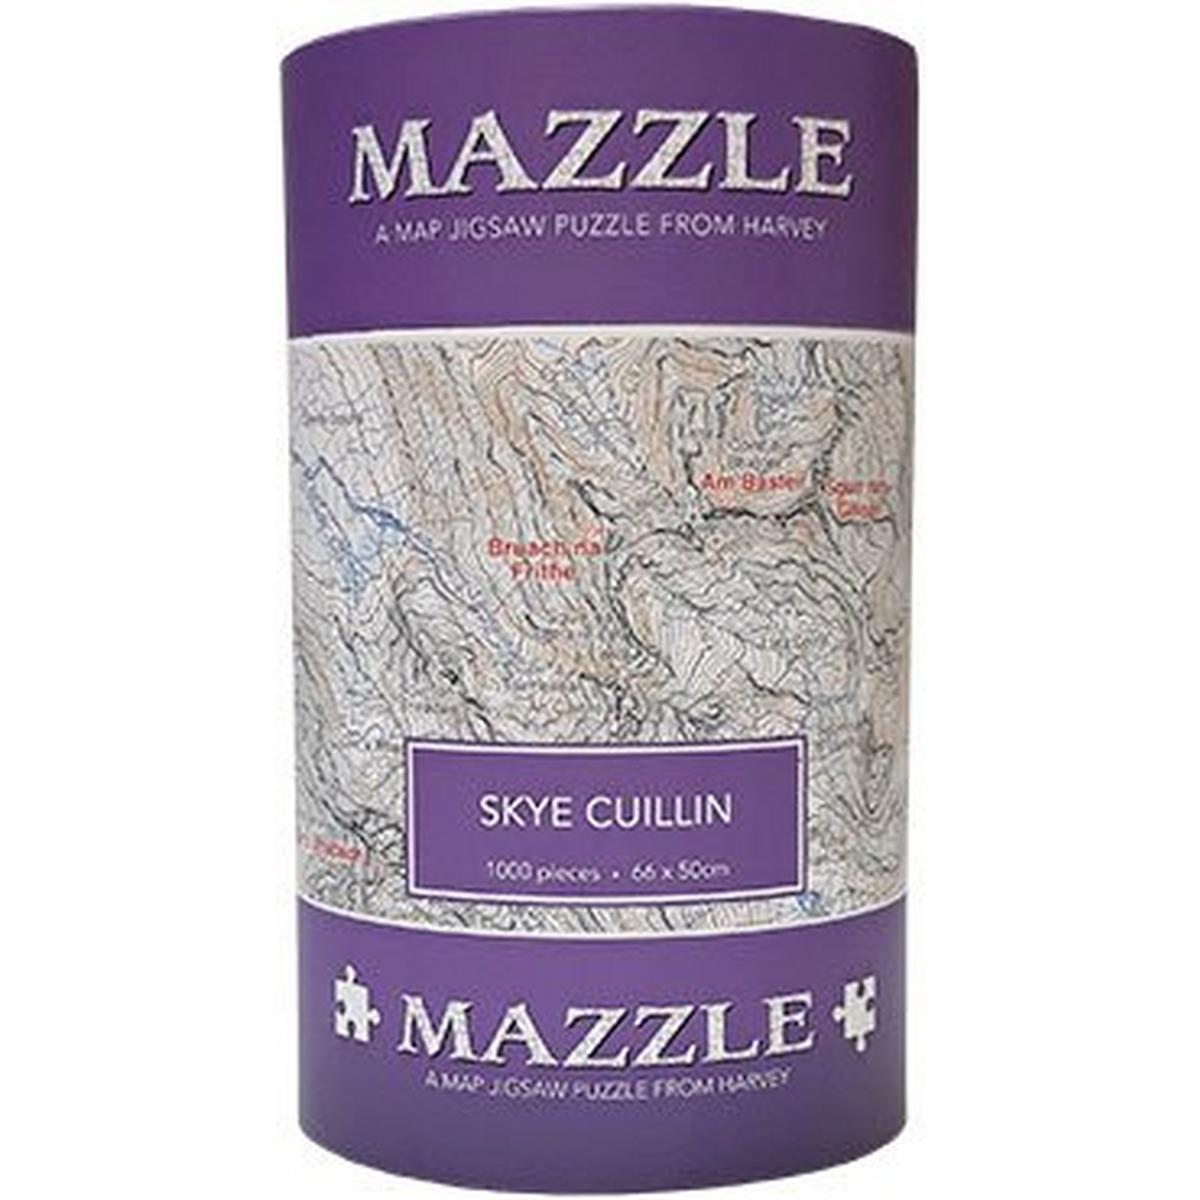 Harveys Mazzle Skye The Cuillin